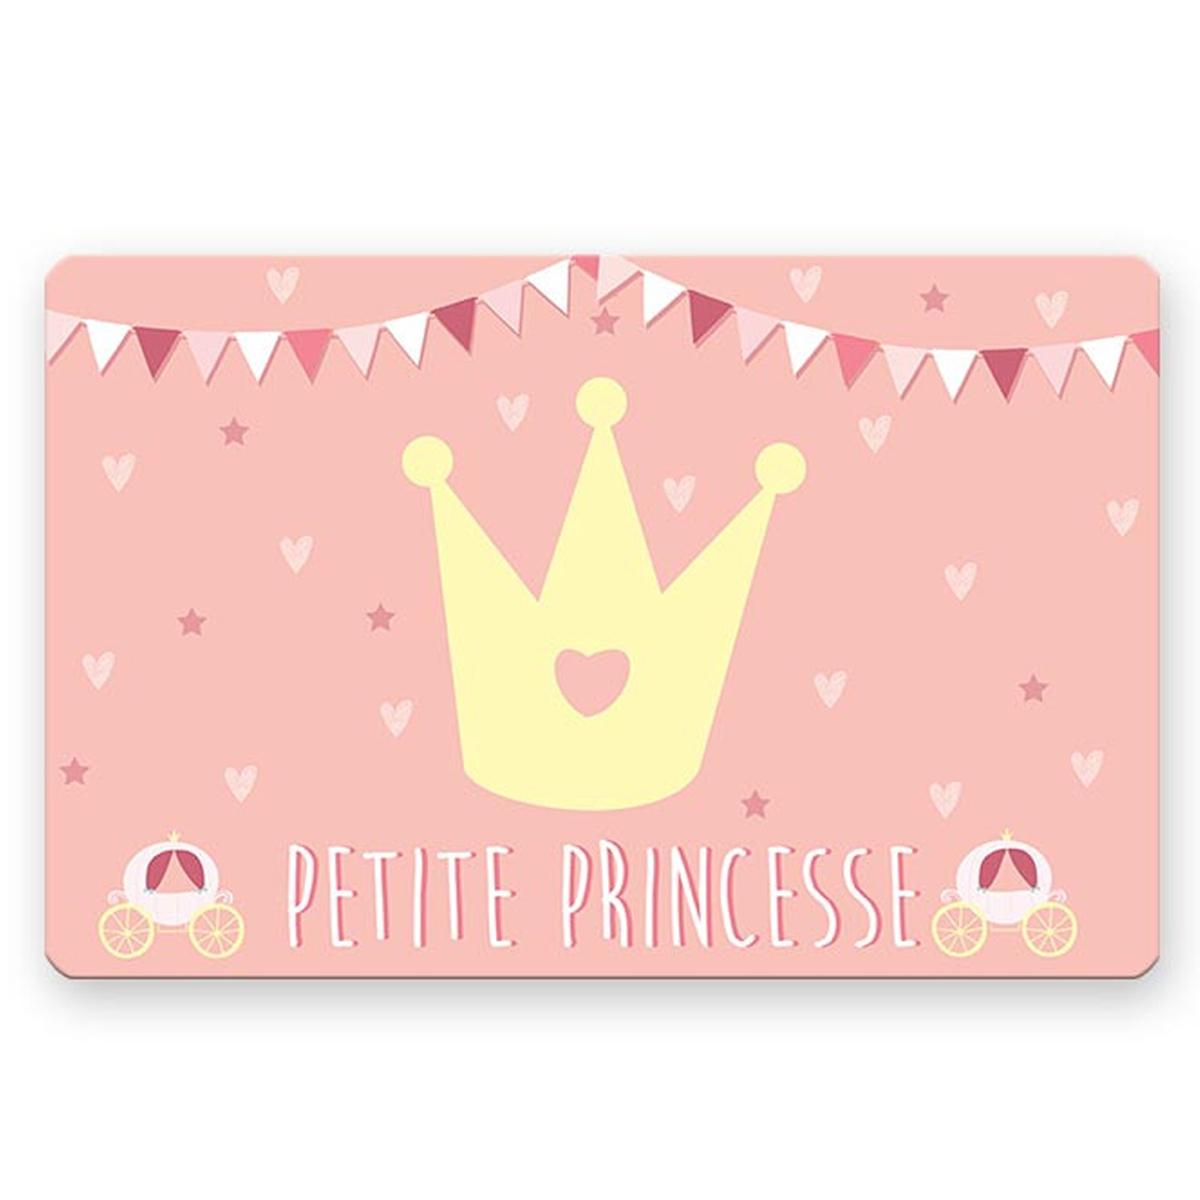 Set de table \'Petite Princesse\' rose - 43x28 cm - [A1907]